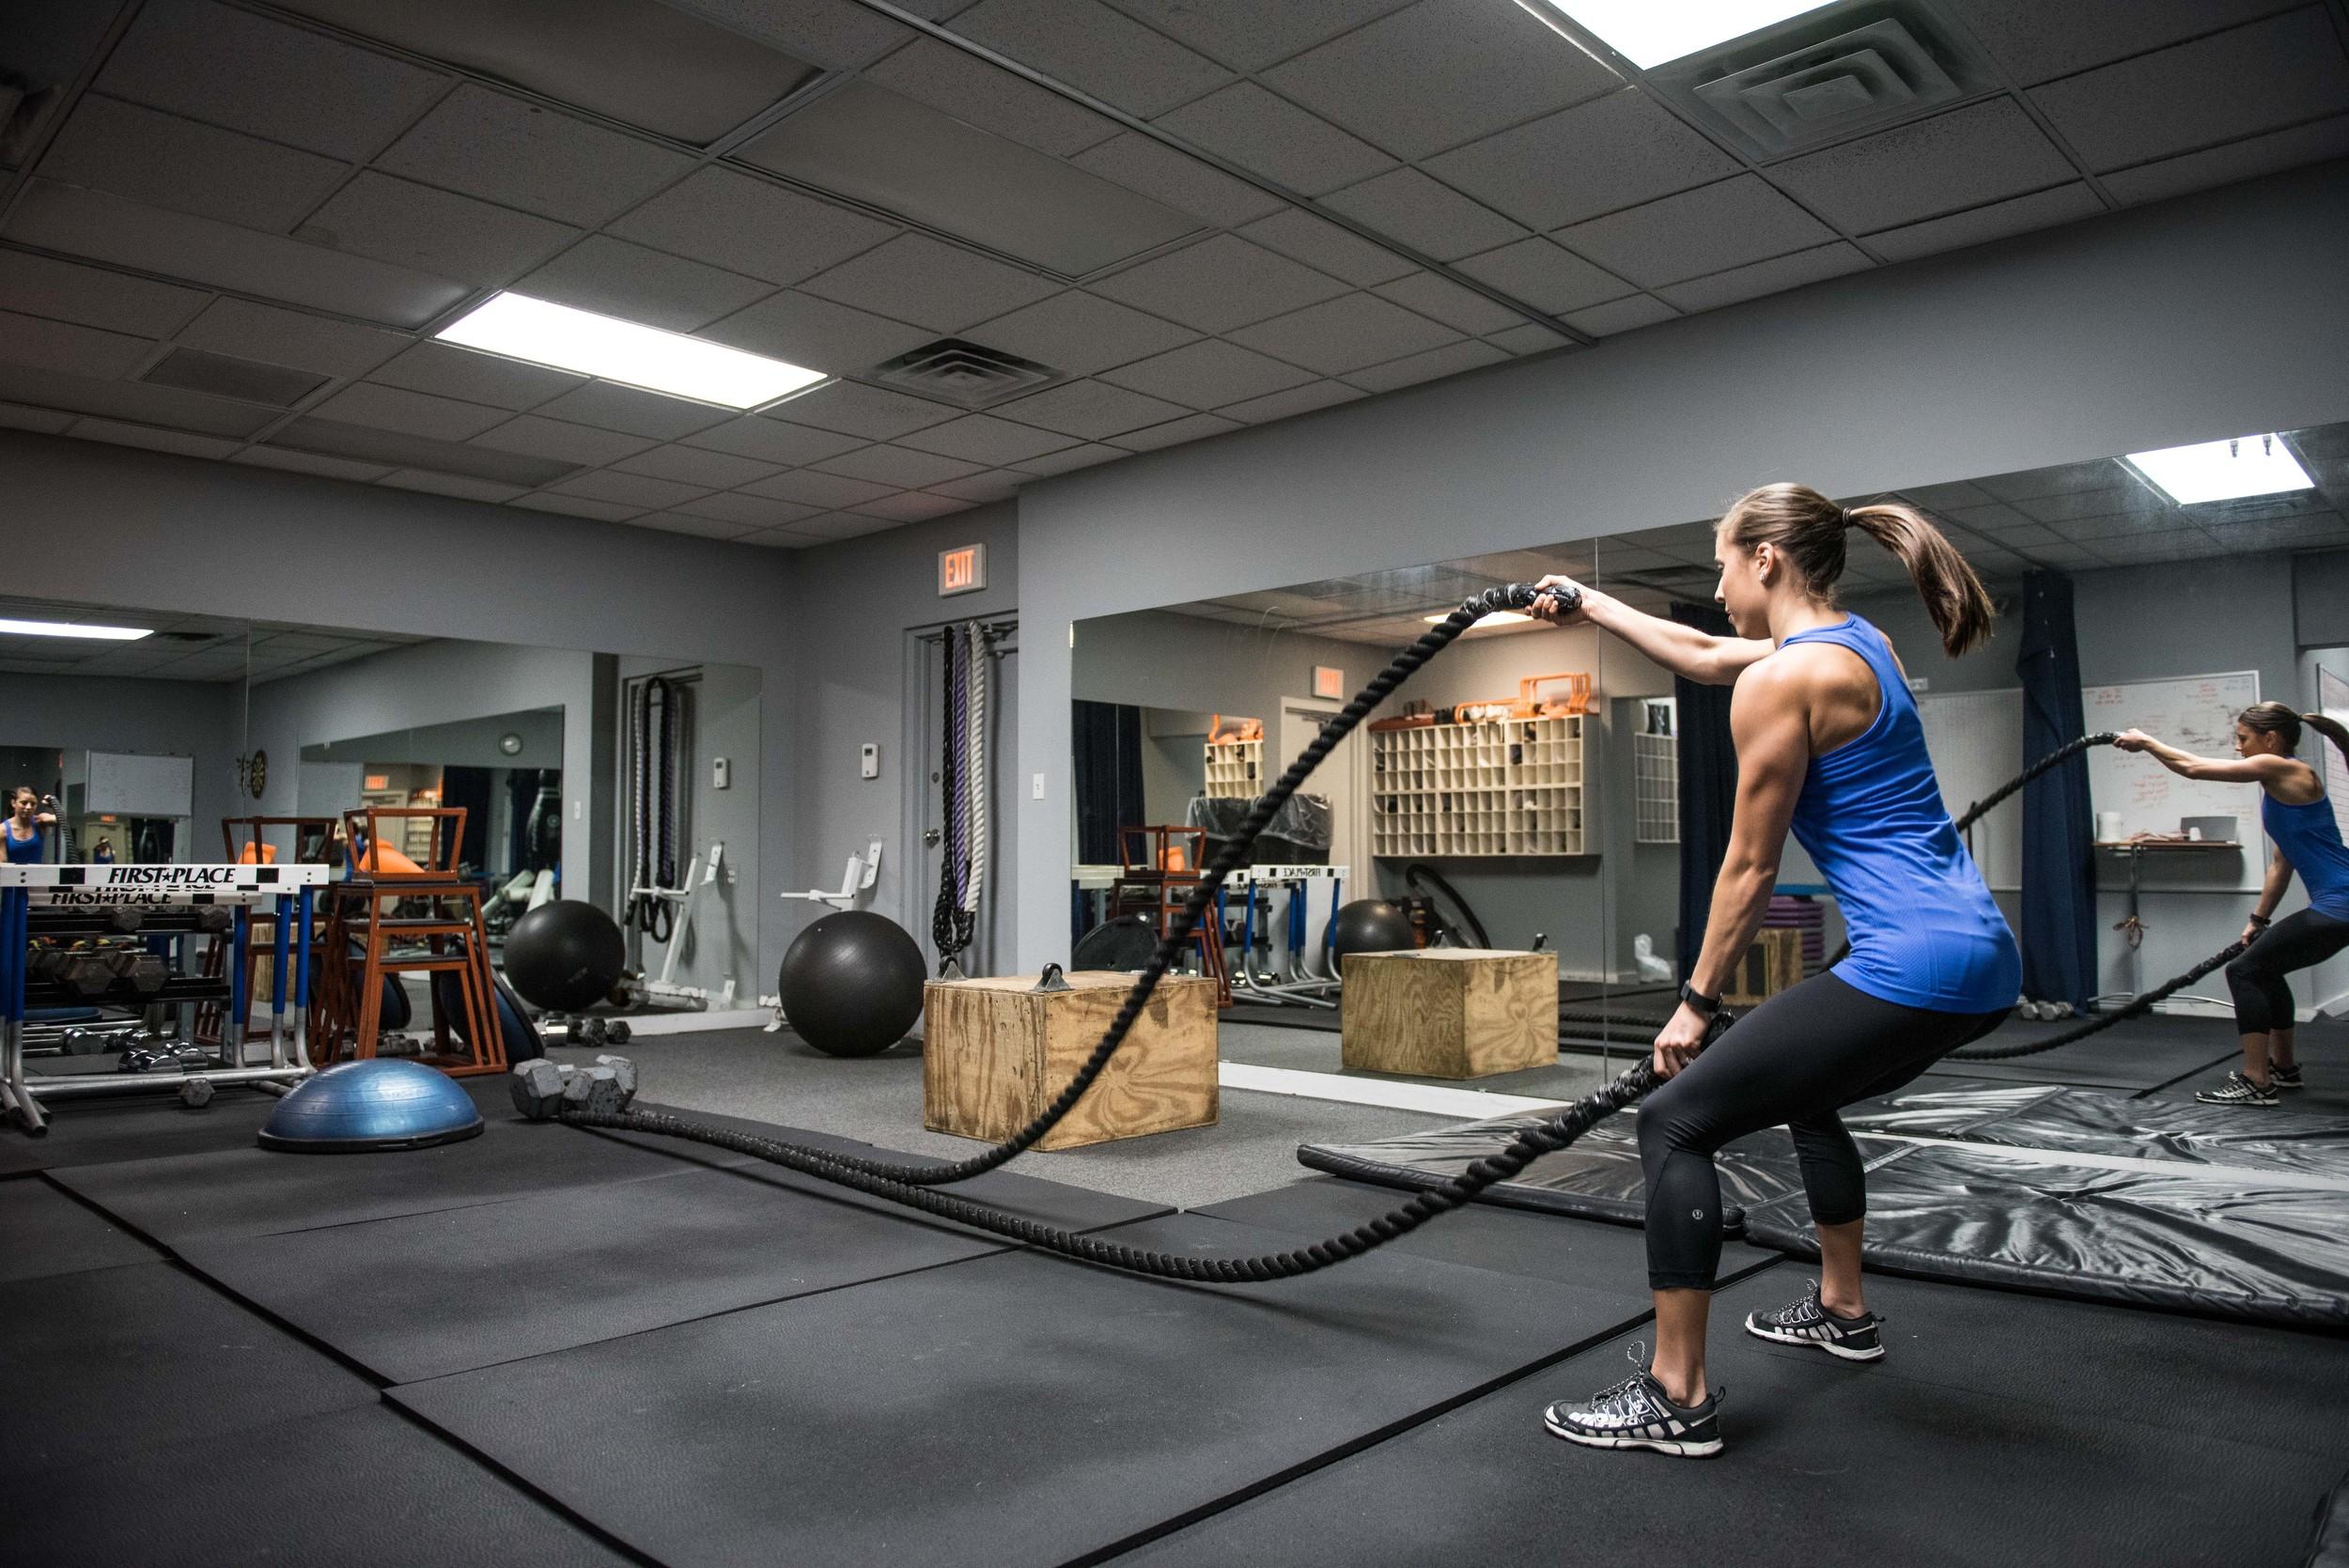 Rope slam workout